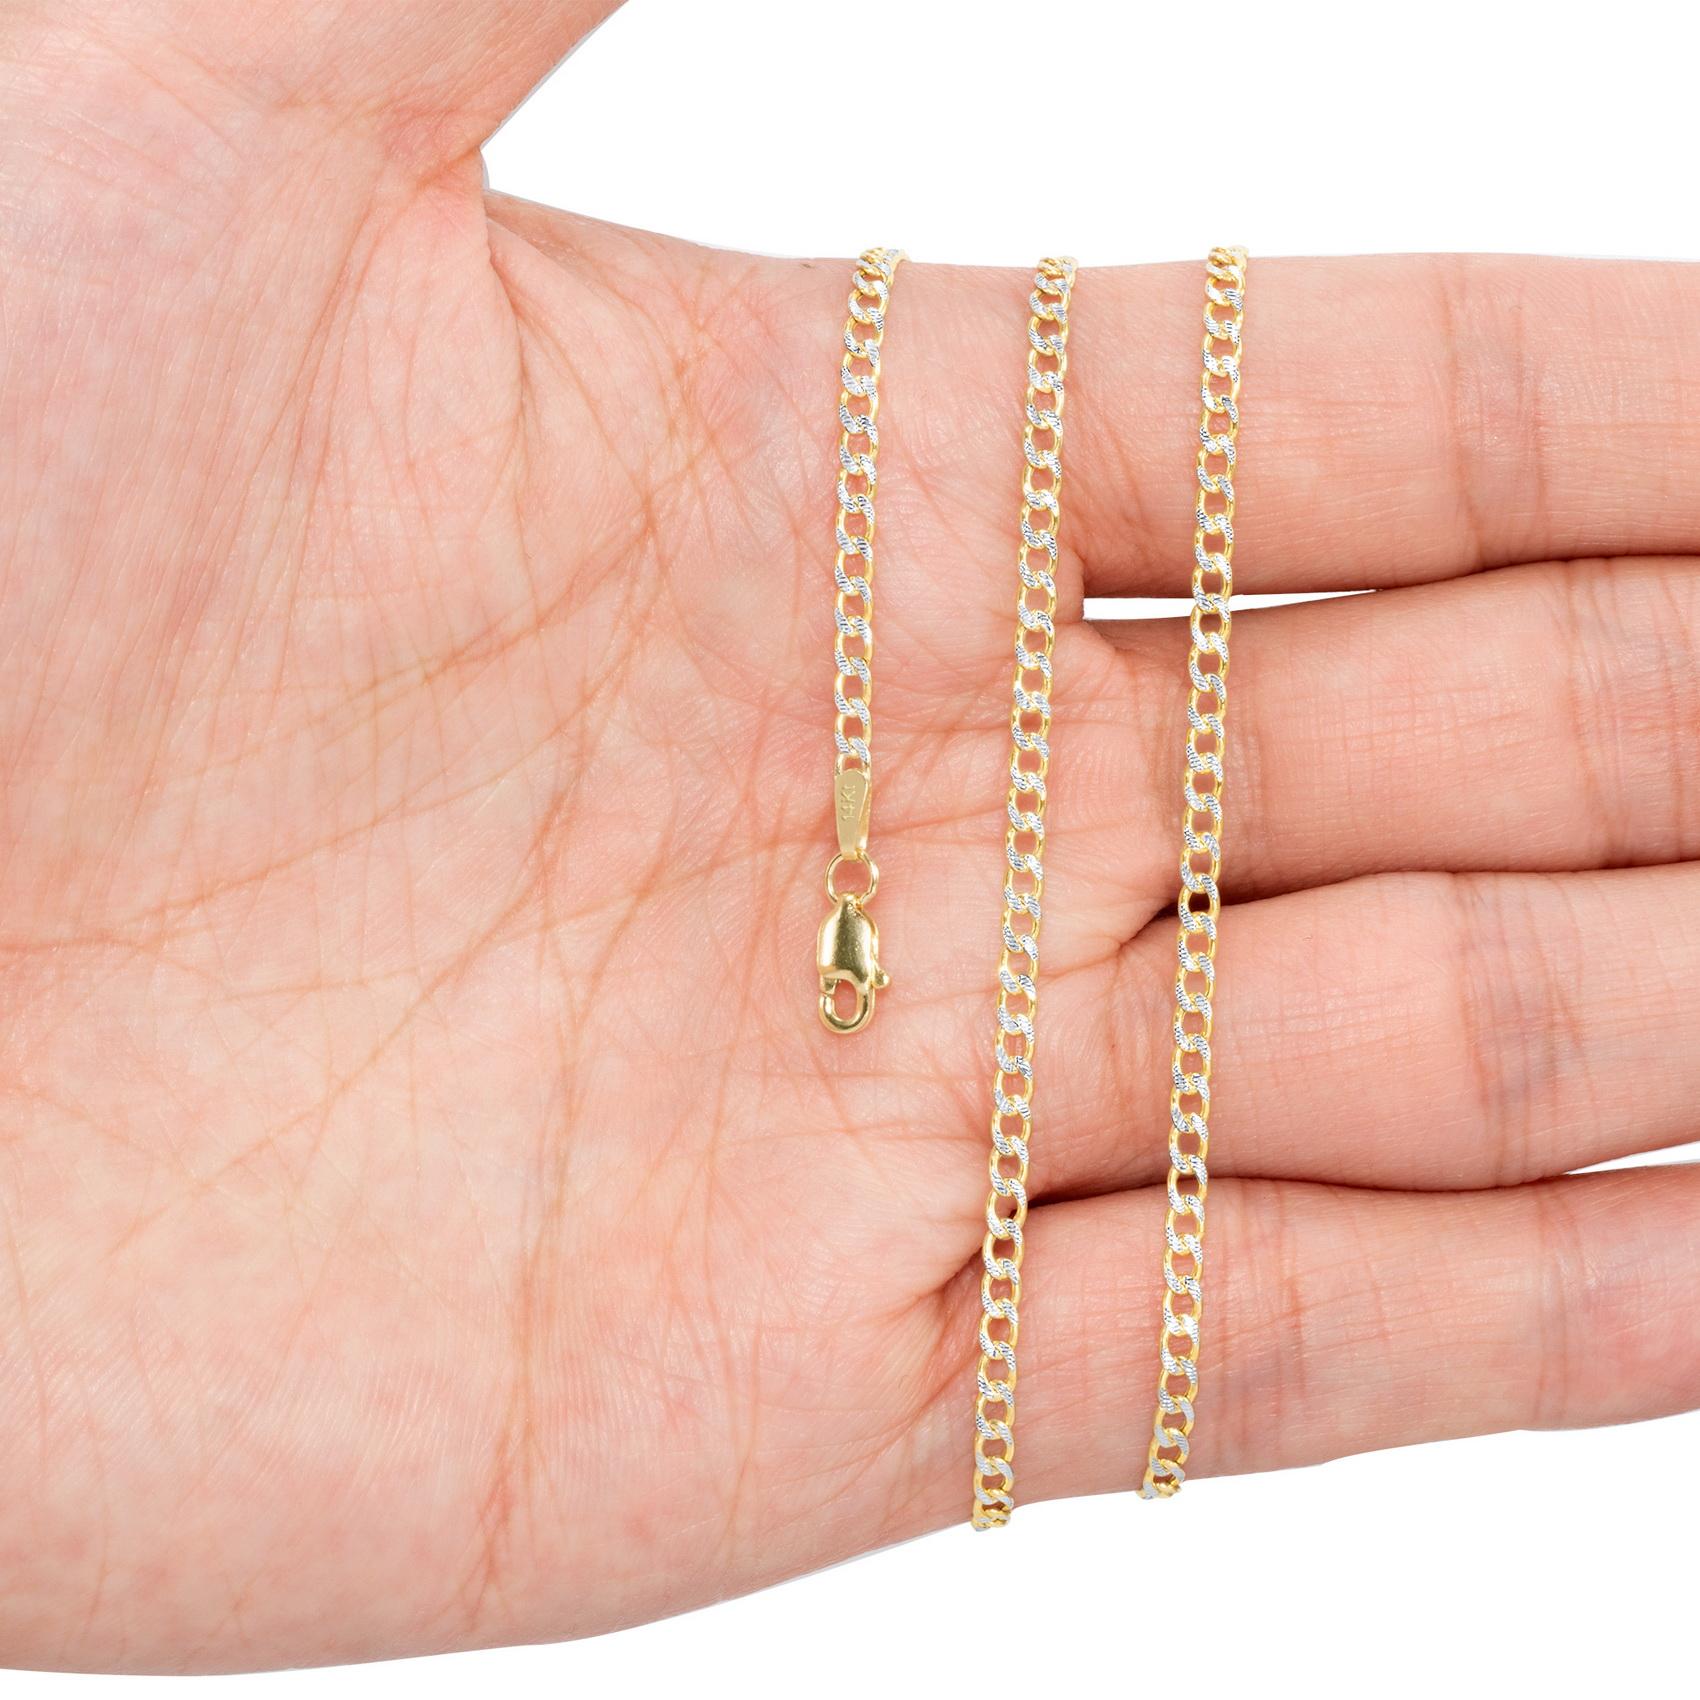 10K-Yellow-Gold-2mm-10-5mm-Diamond-Cut-Pave-Cuban-Chain-Necklace-Bracelet-7-034-30-034 thumbnail 13